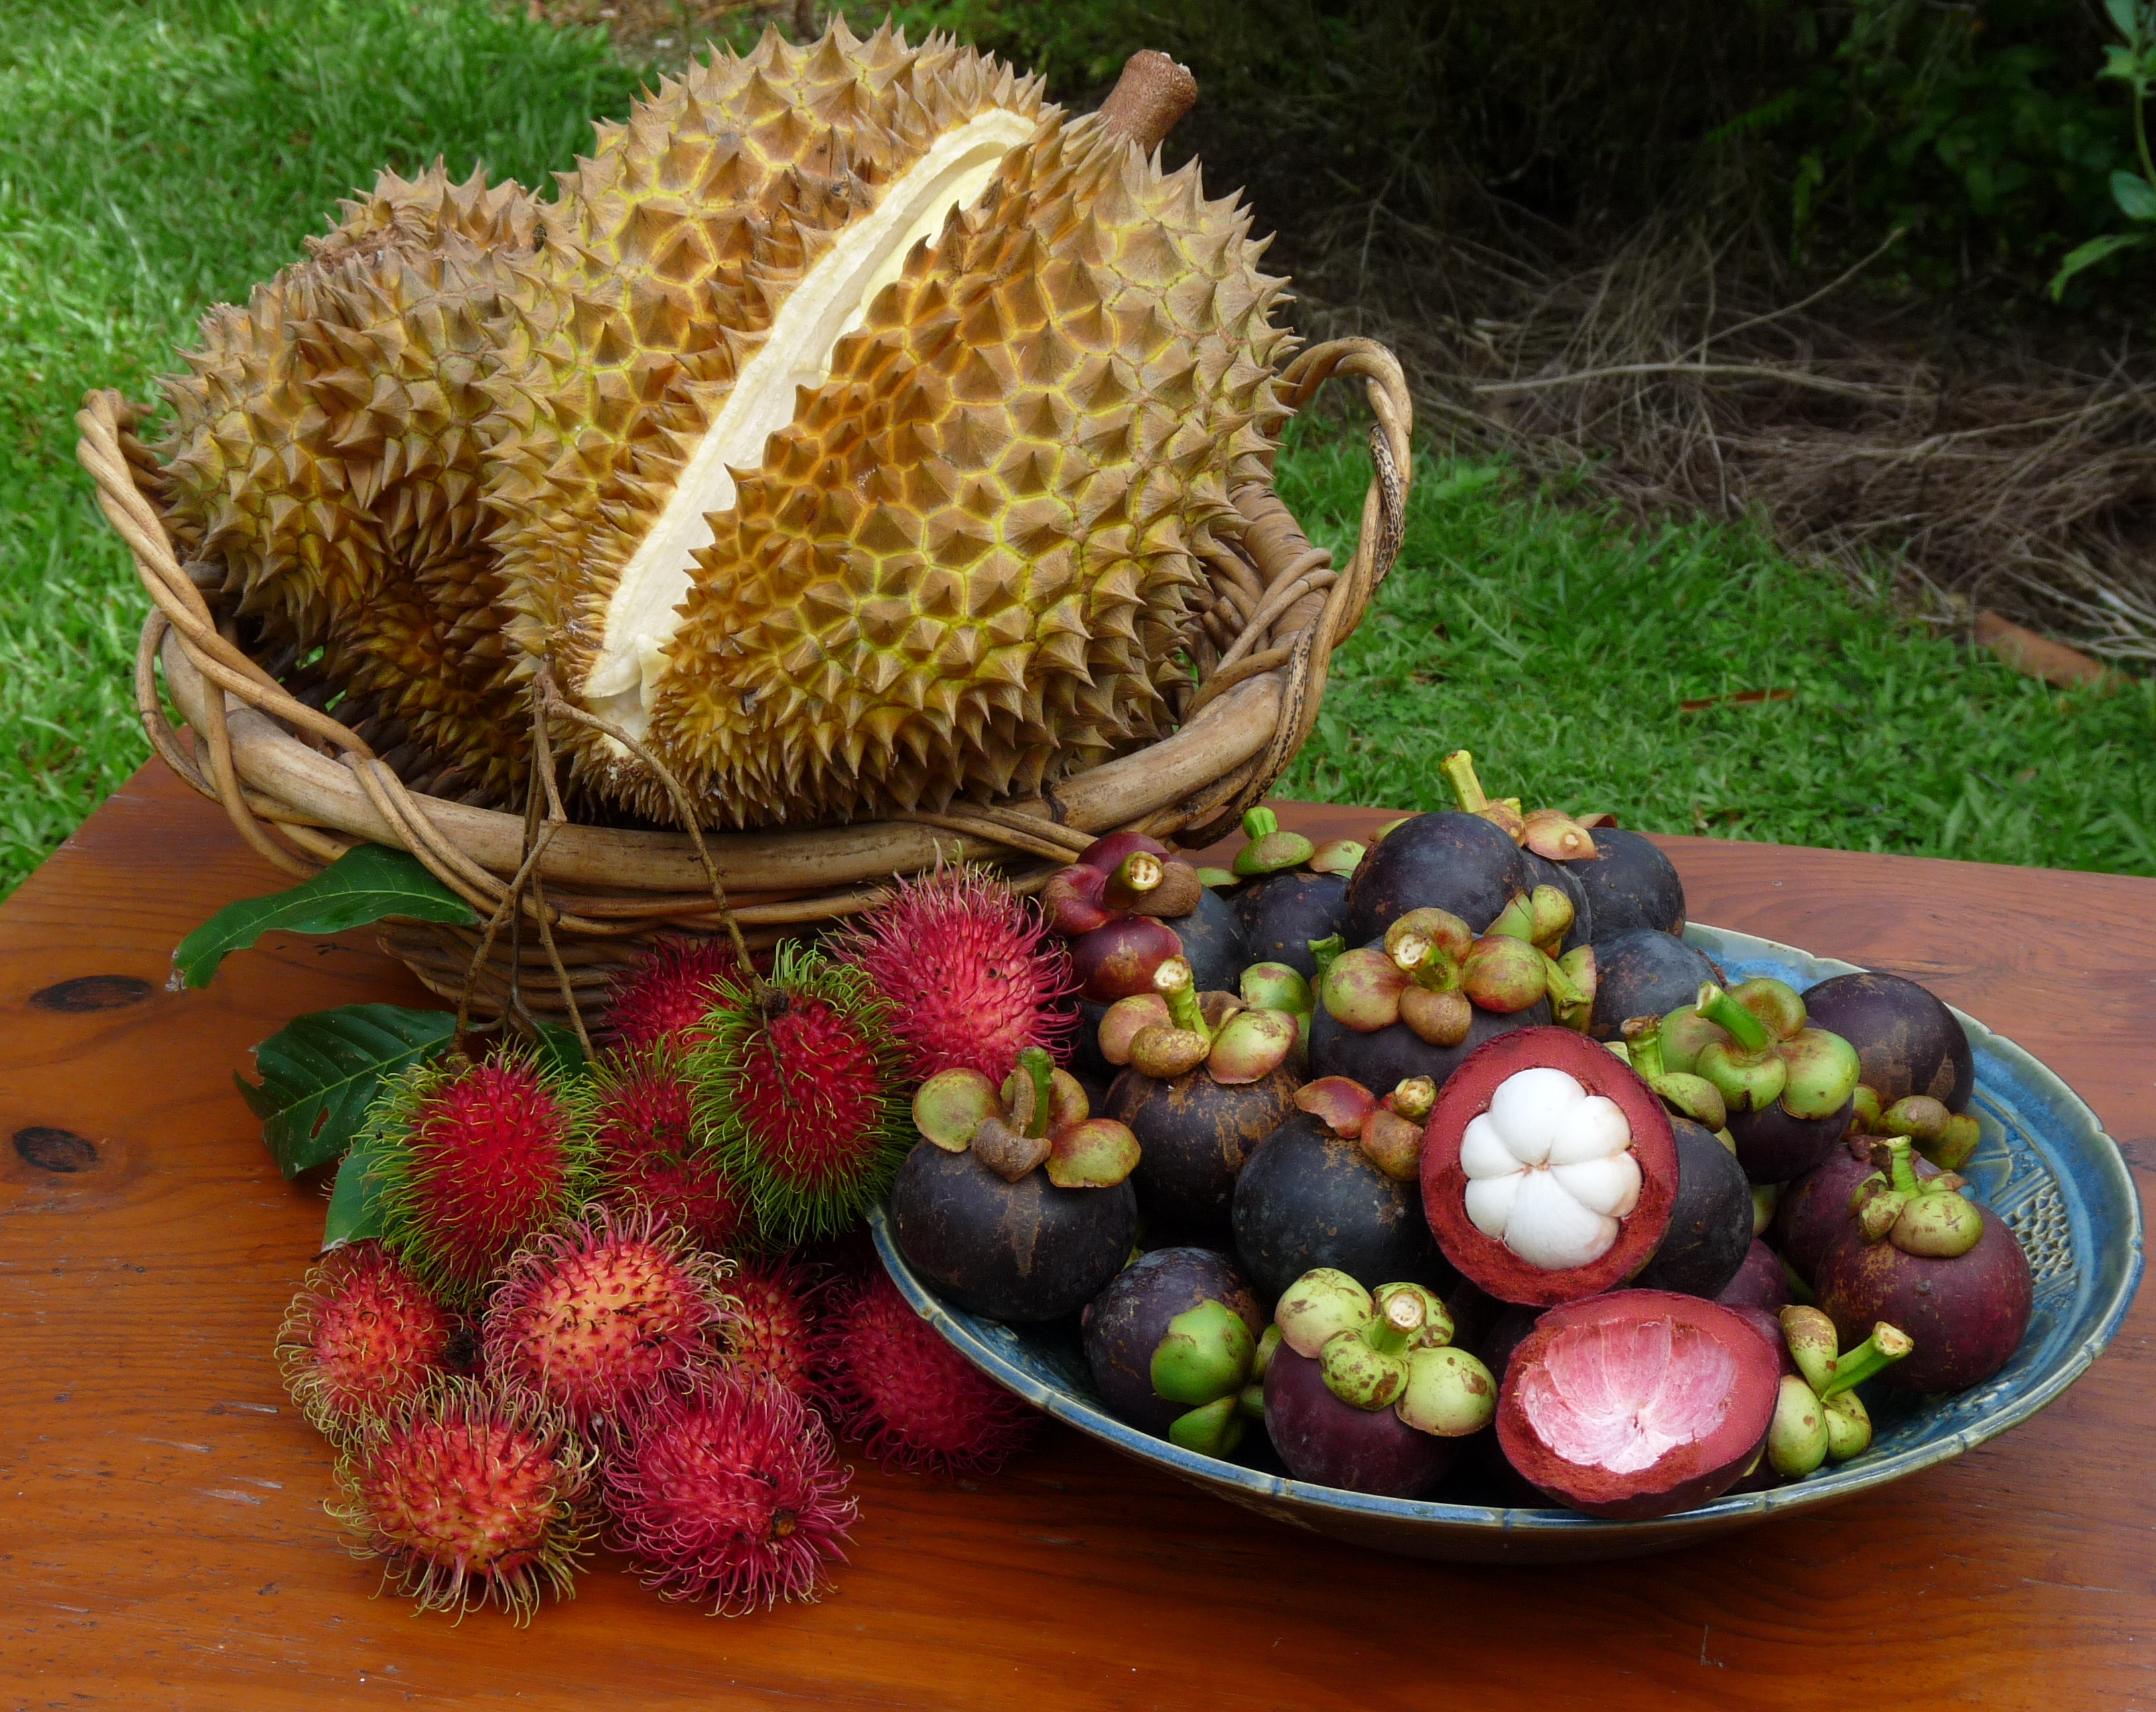 Durian, rambutan and mangosteen. Photo taken on March 20, 2010.